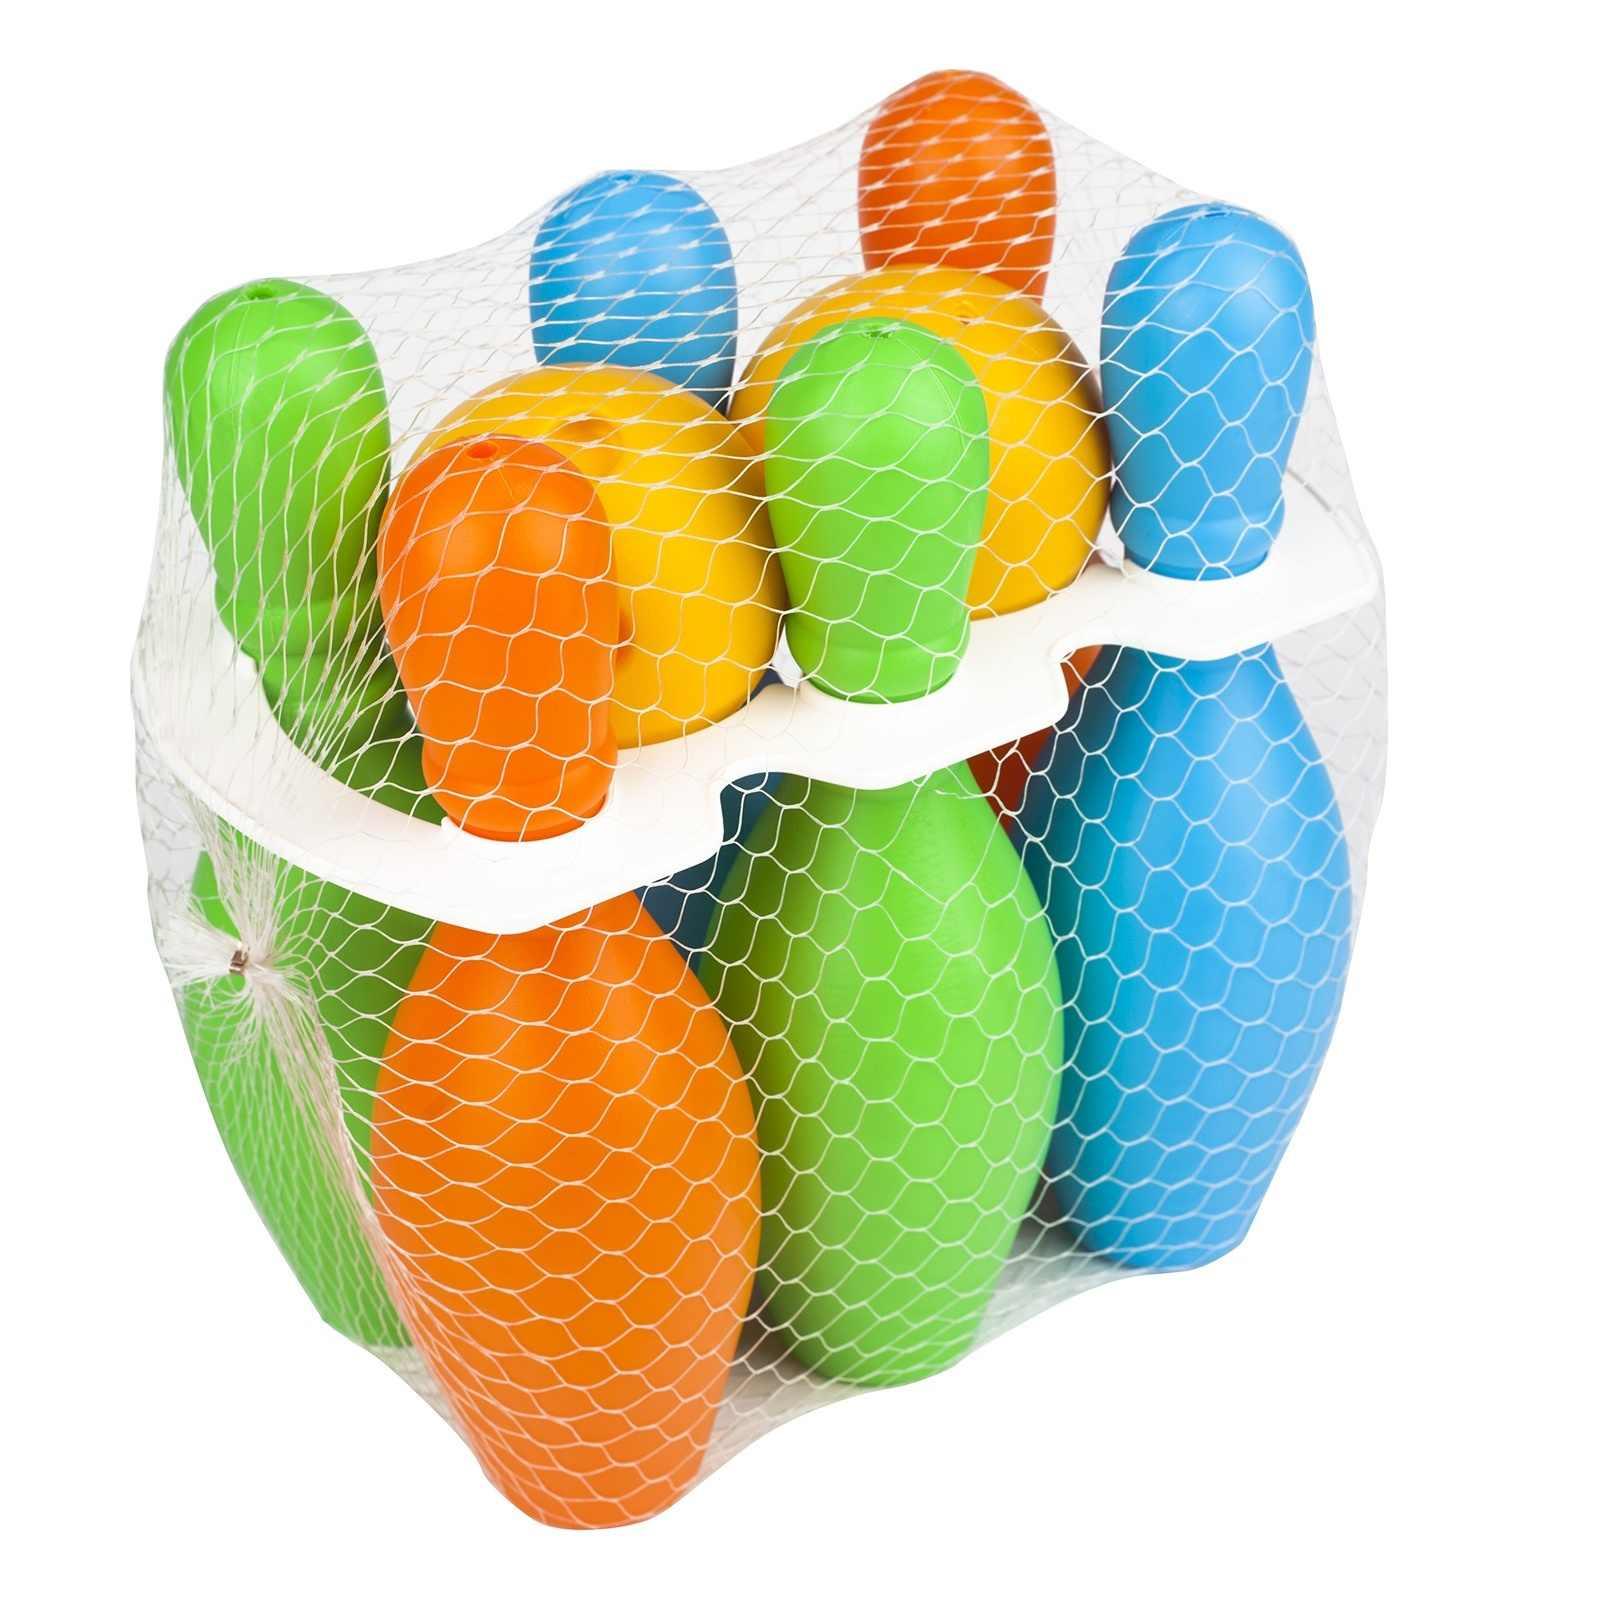 Ebebek baby & toys AE-0602-EB детский набор для боулинга